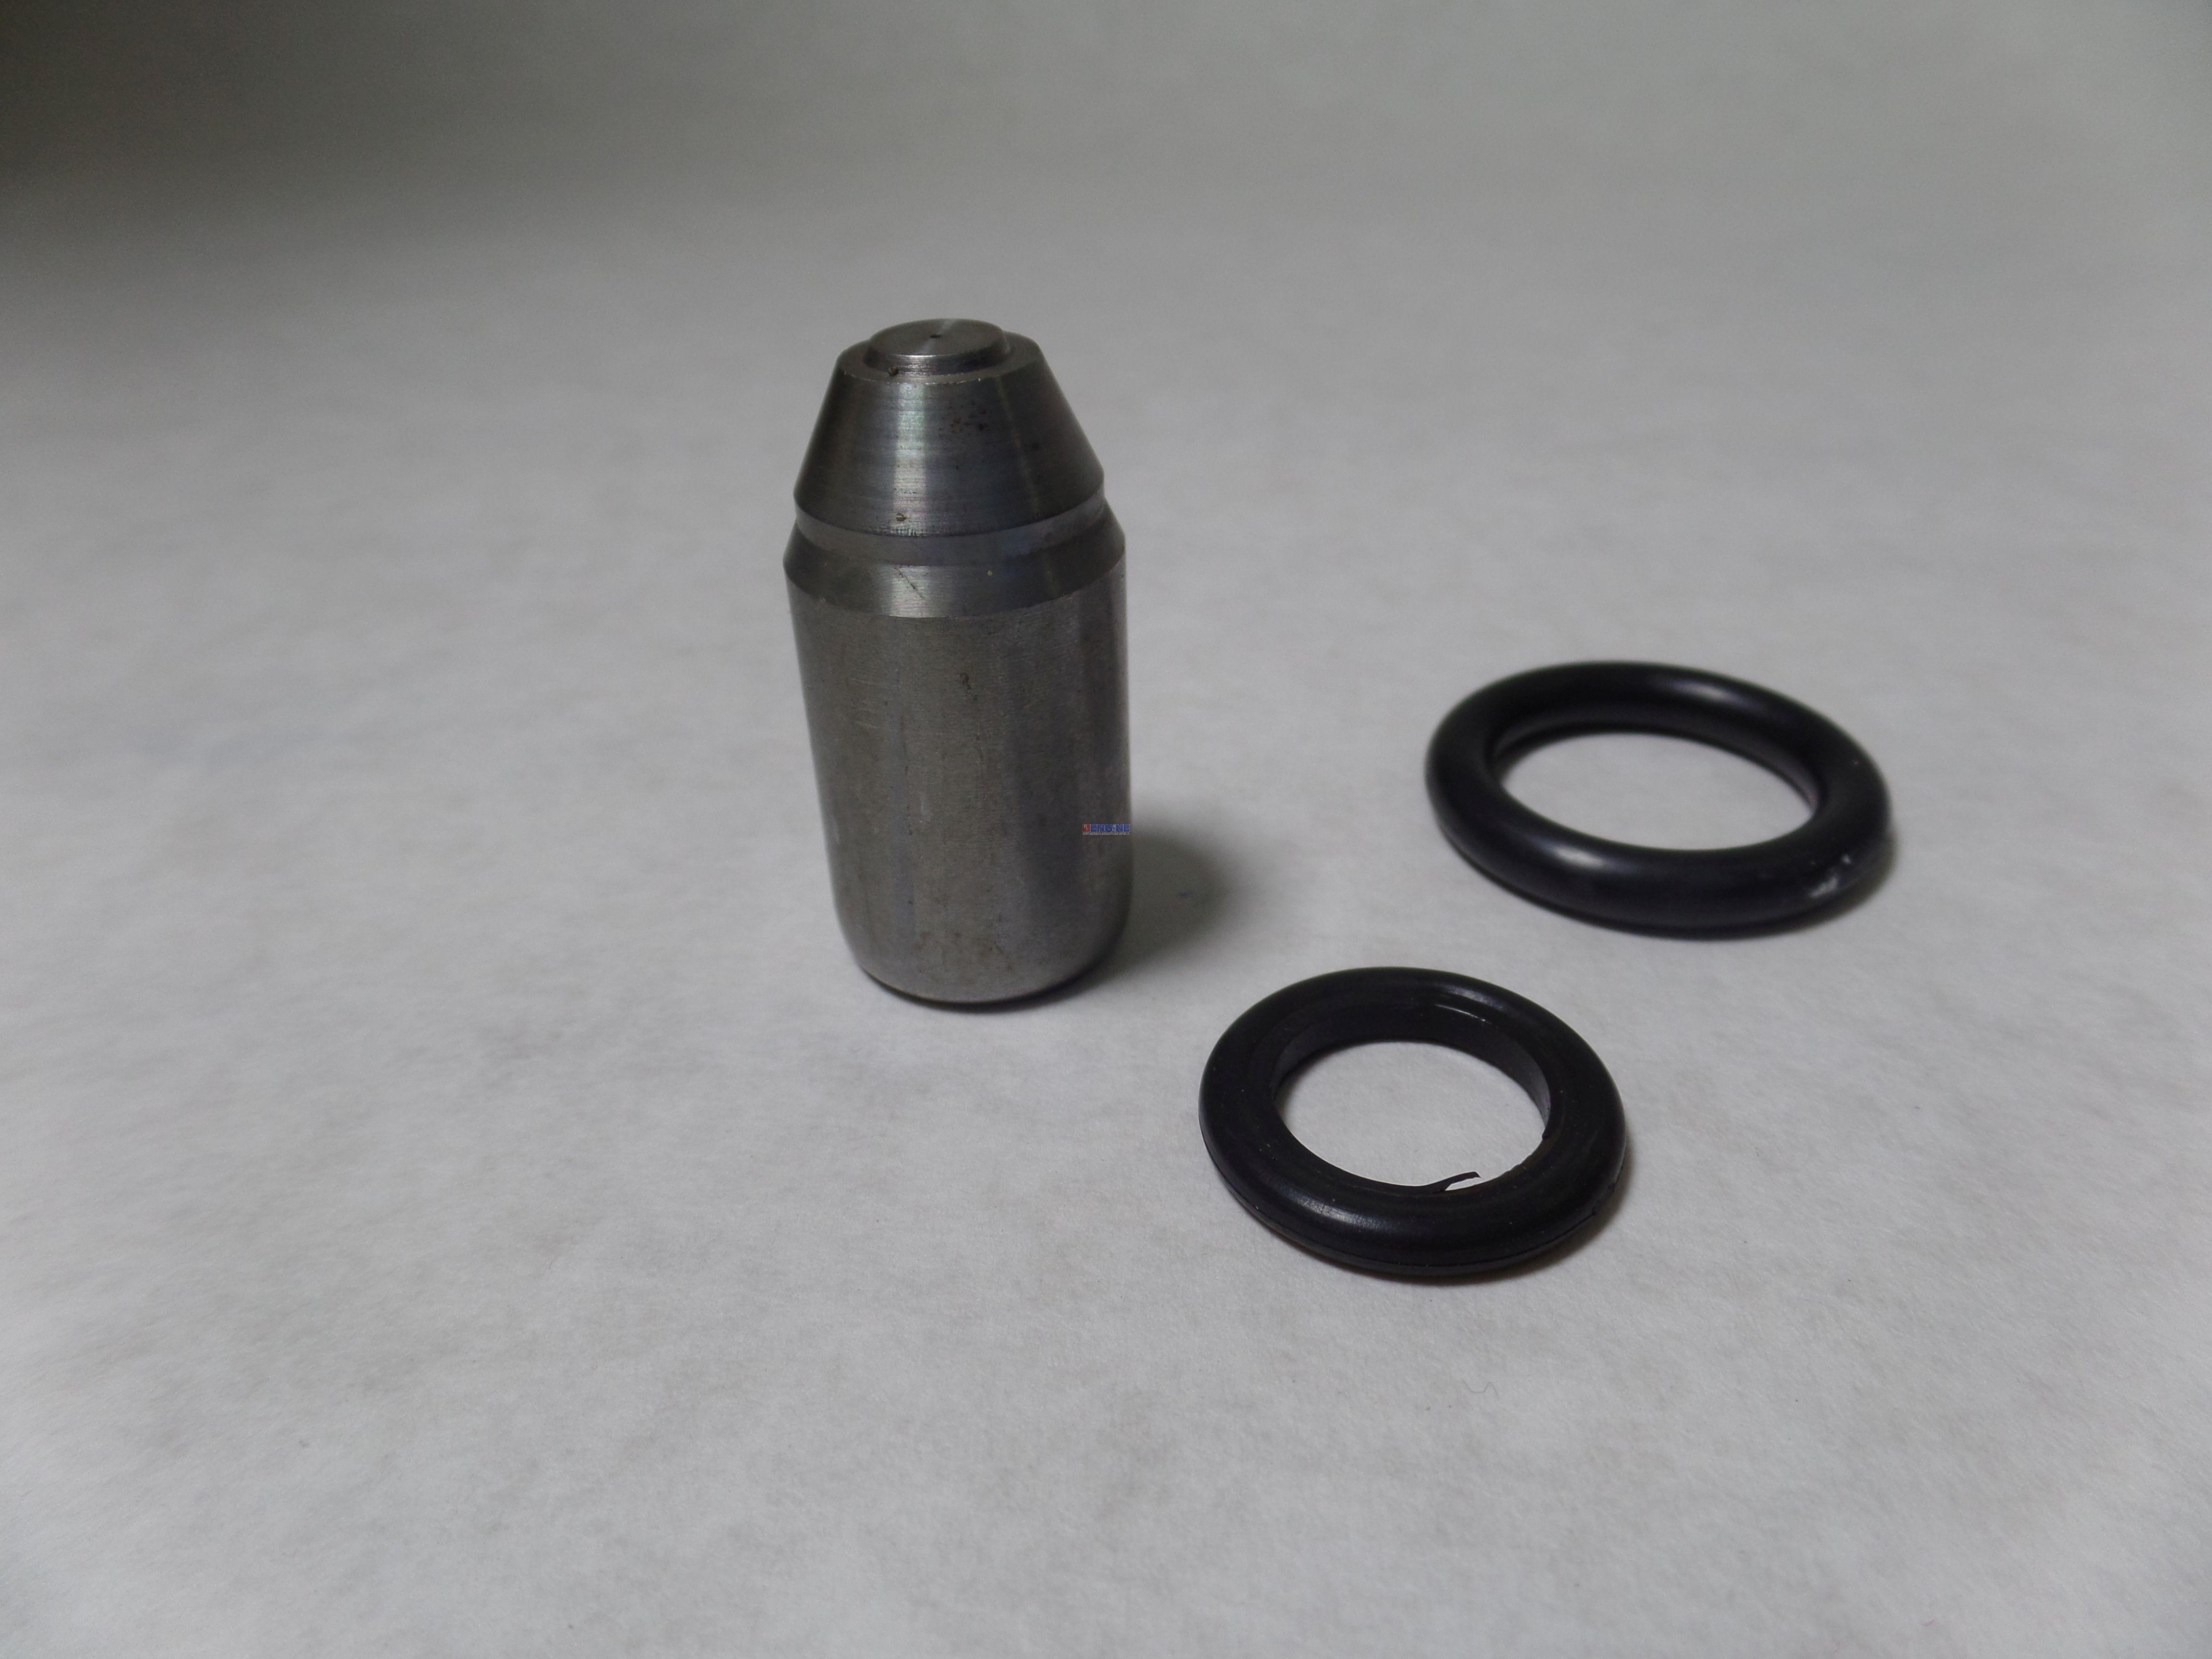 100+ Cat 3406e Injector Adjustment – yasminroohi